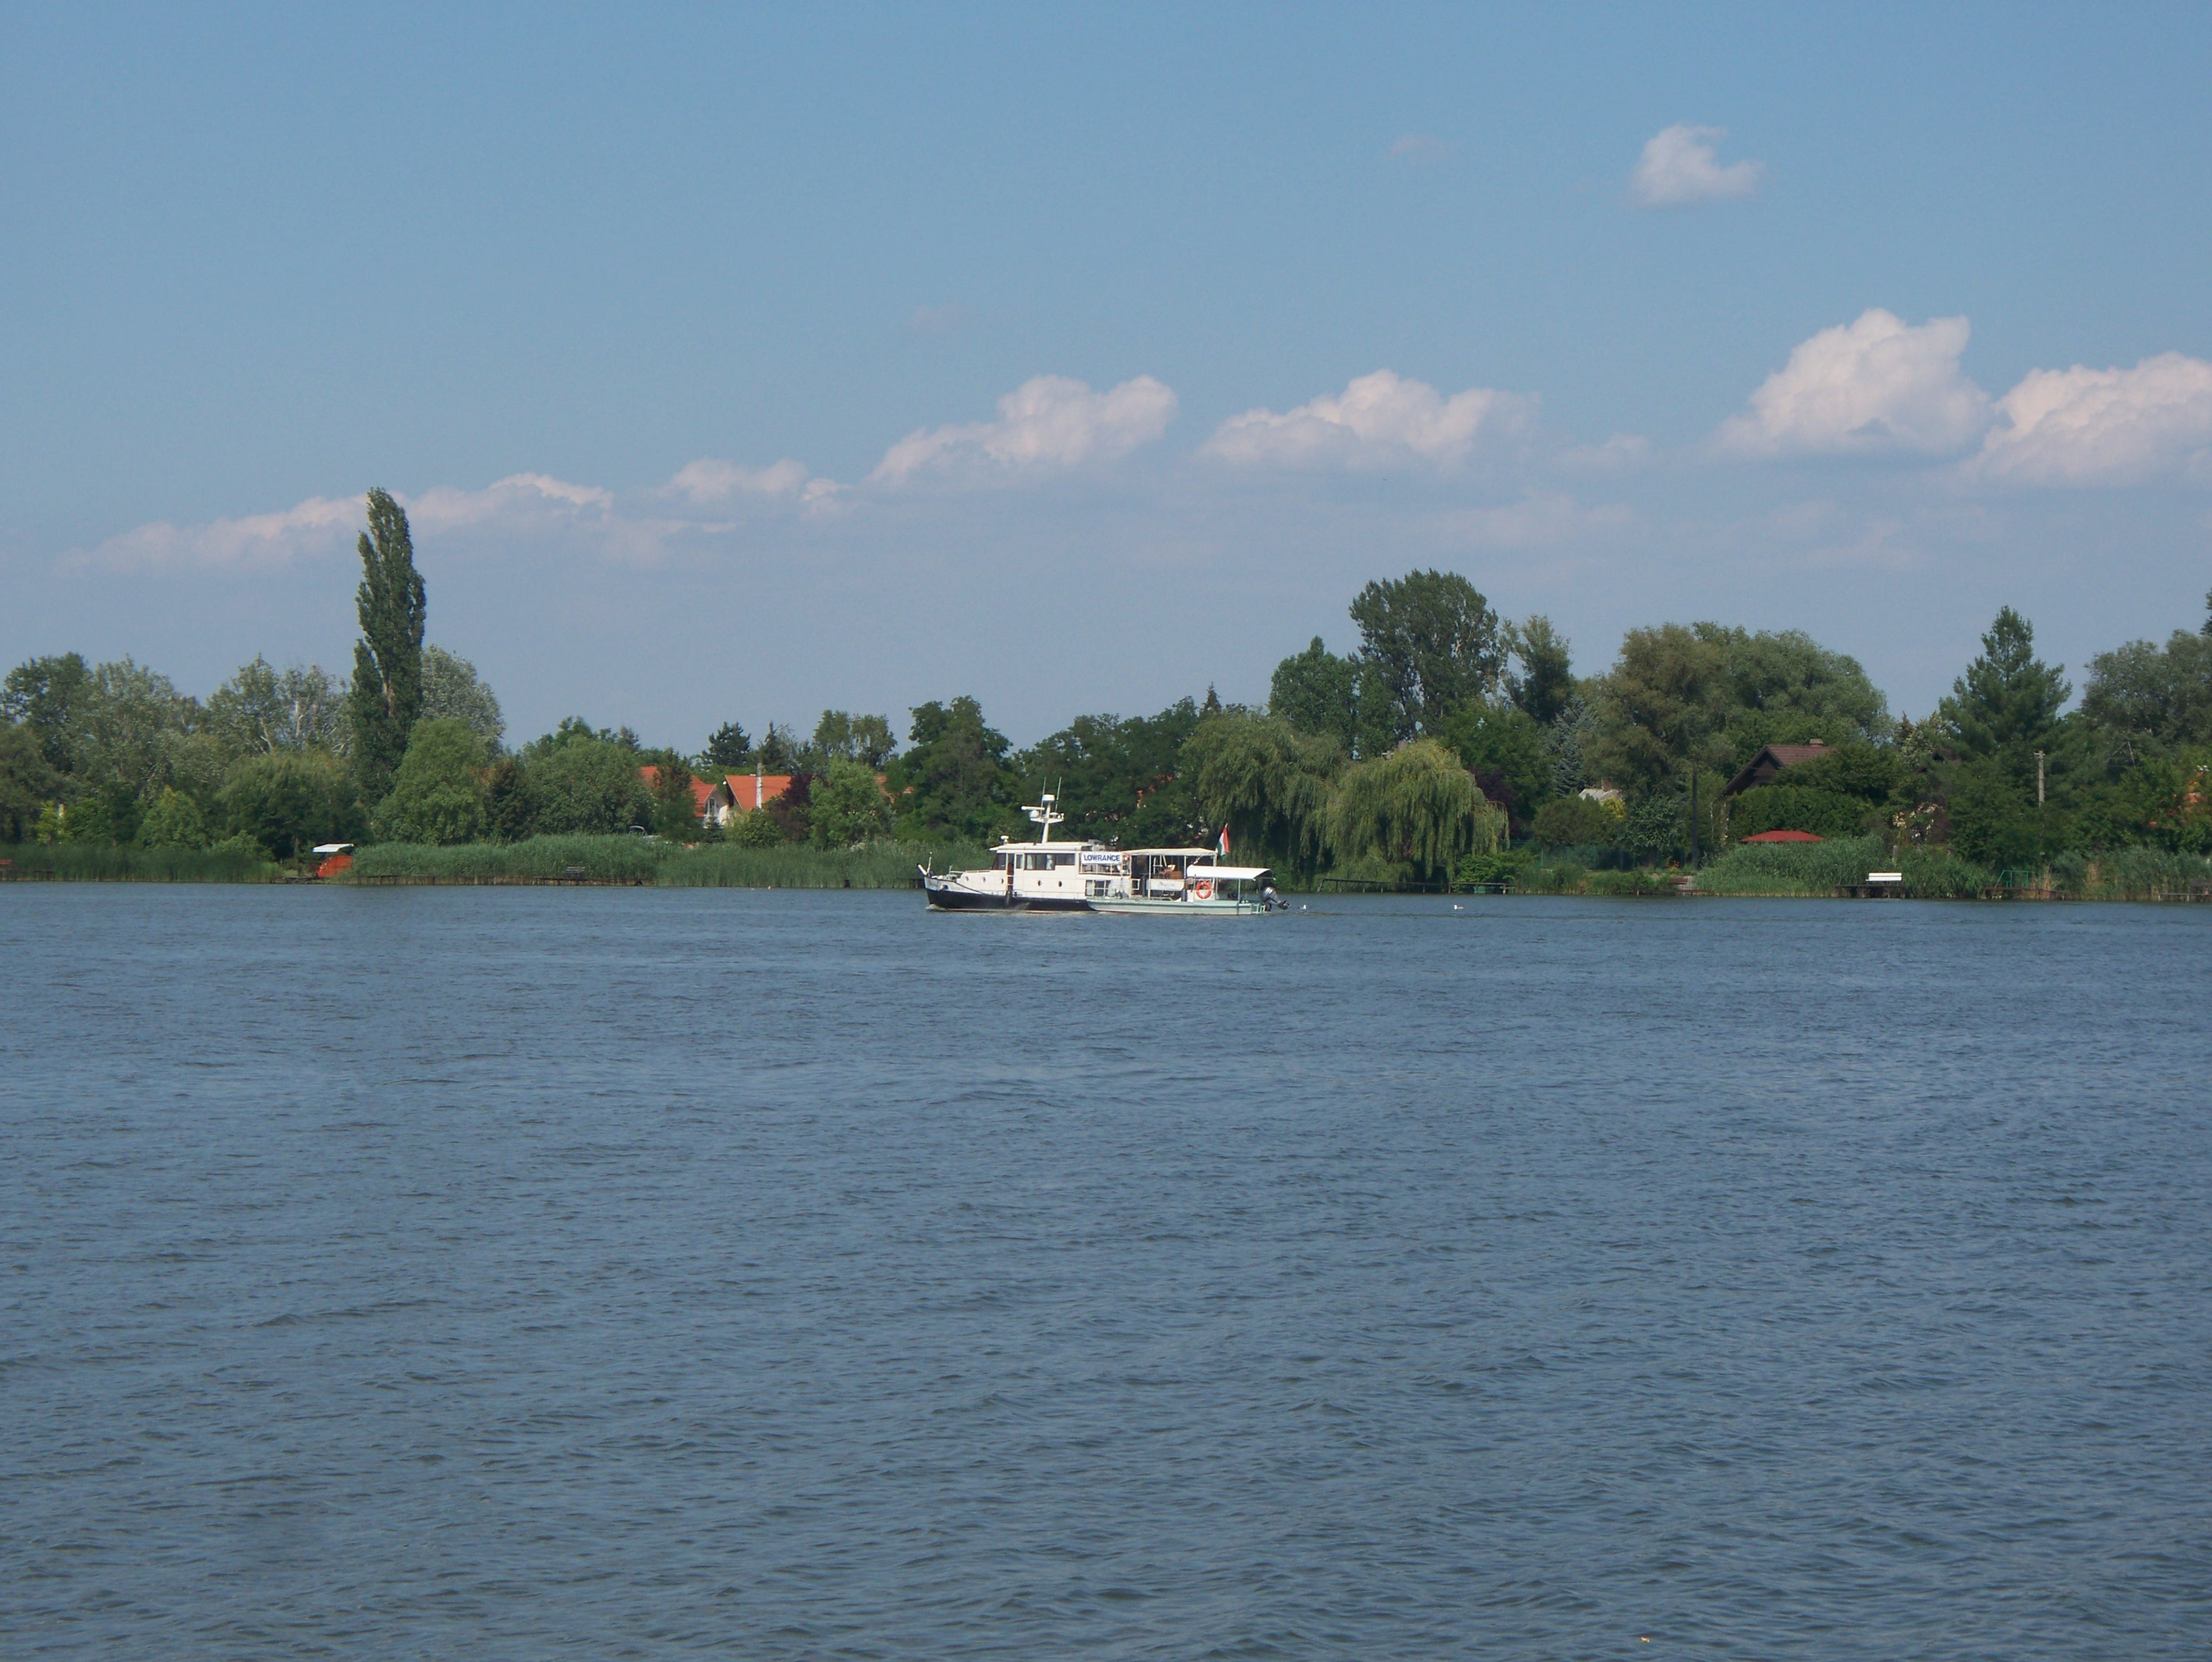 http://www.kisdunainagyhajok.hu/egyebhajok/2012_06_24_maritime_motoros_vontatohajo_a_rackevei_malom-obolnel/2012_06_24_maritime_motoros_vontatohajo_a_rackevei_malom-obolnel_009.jpg